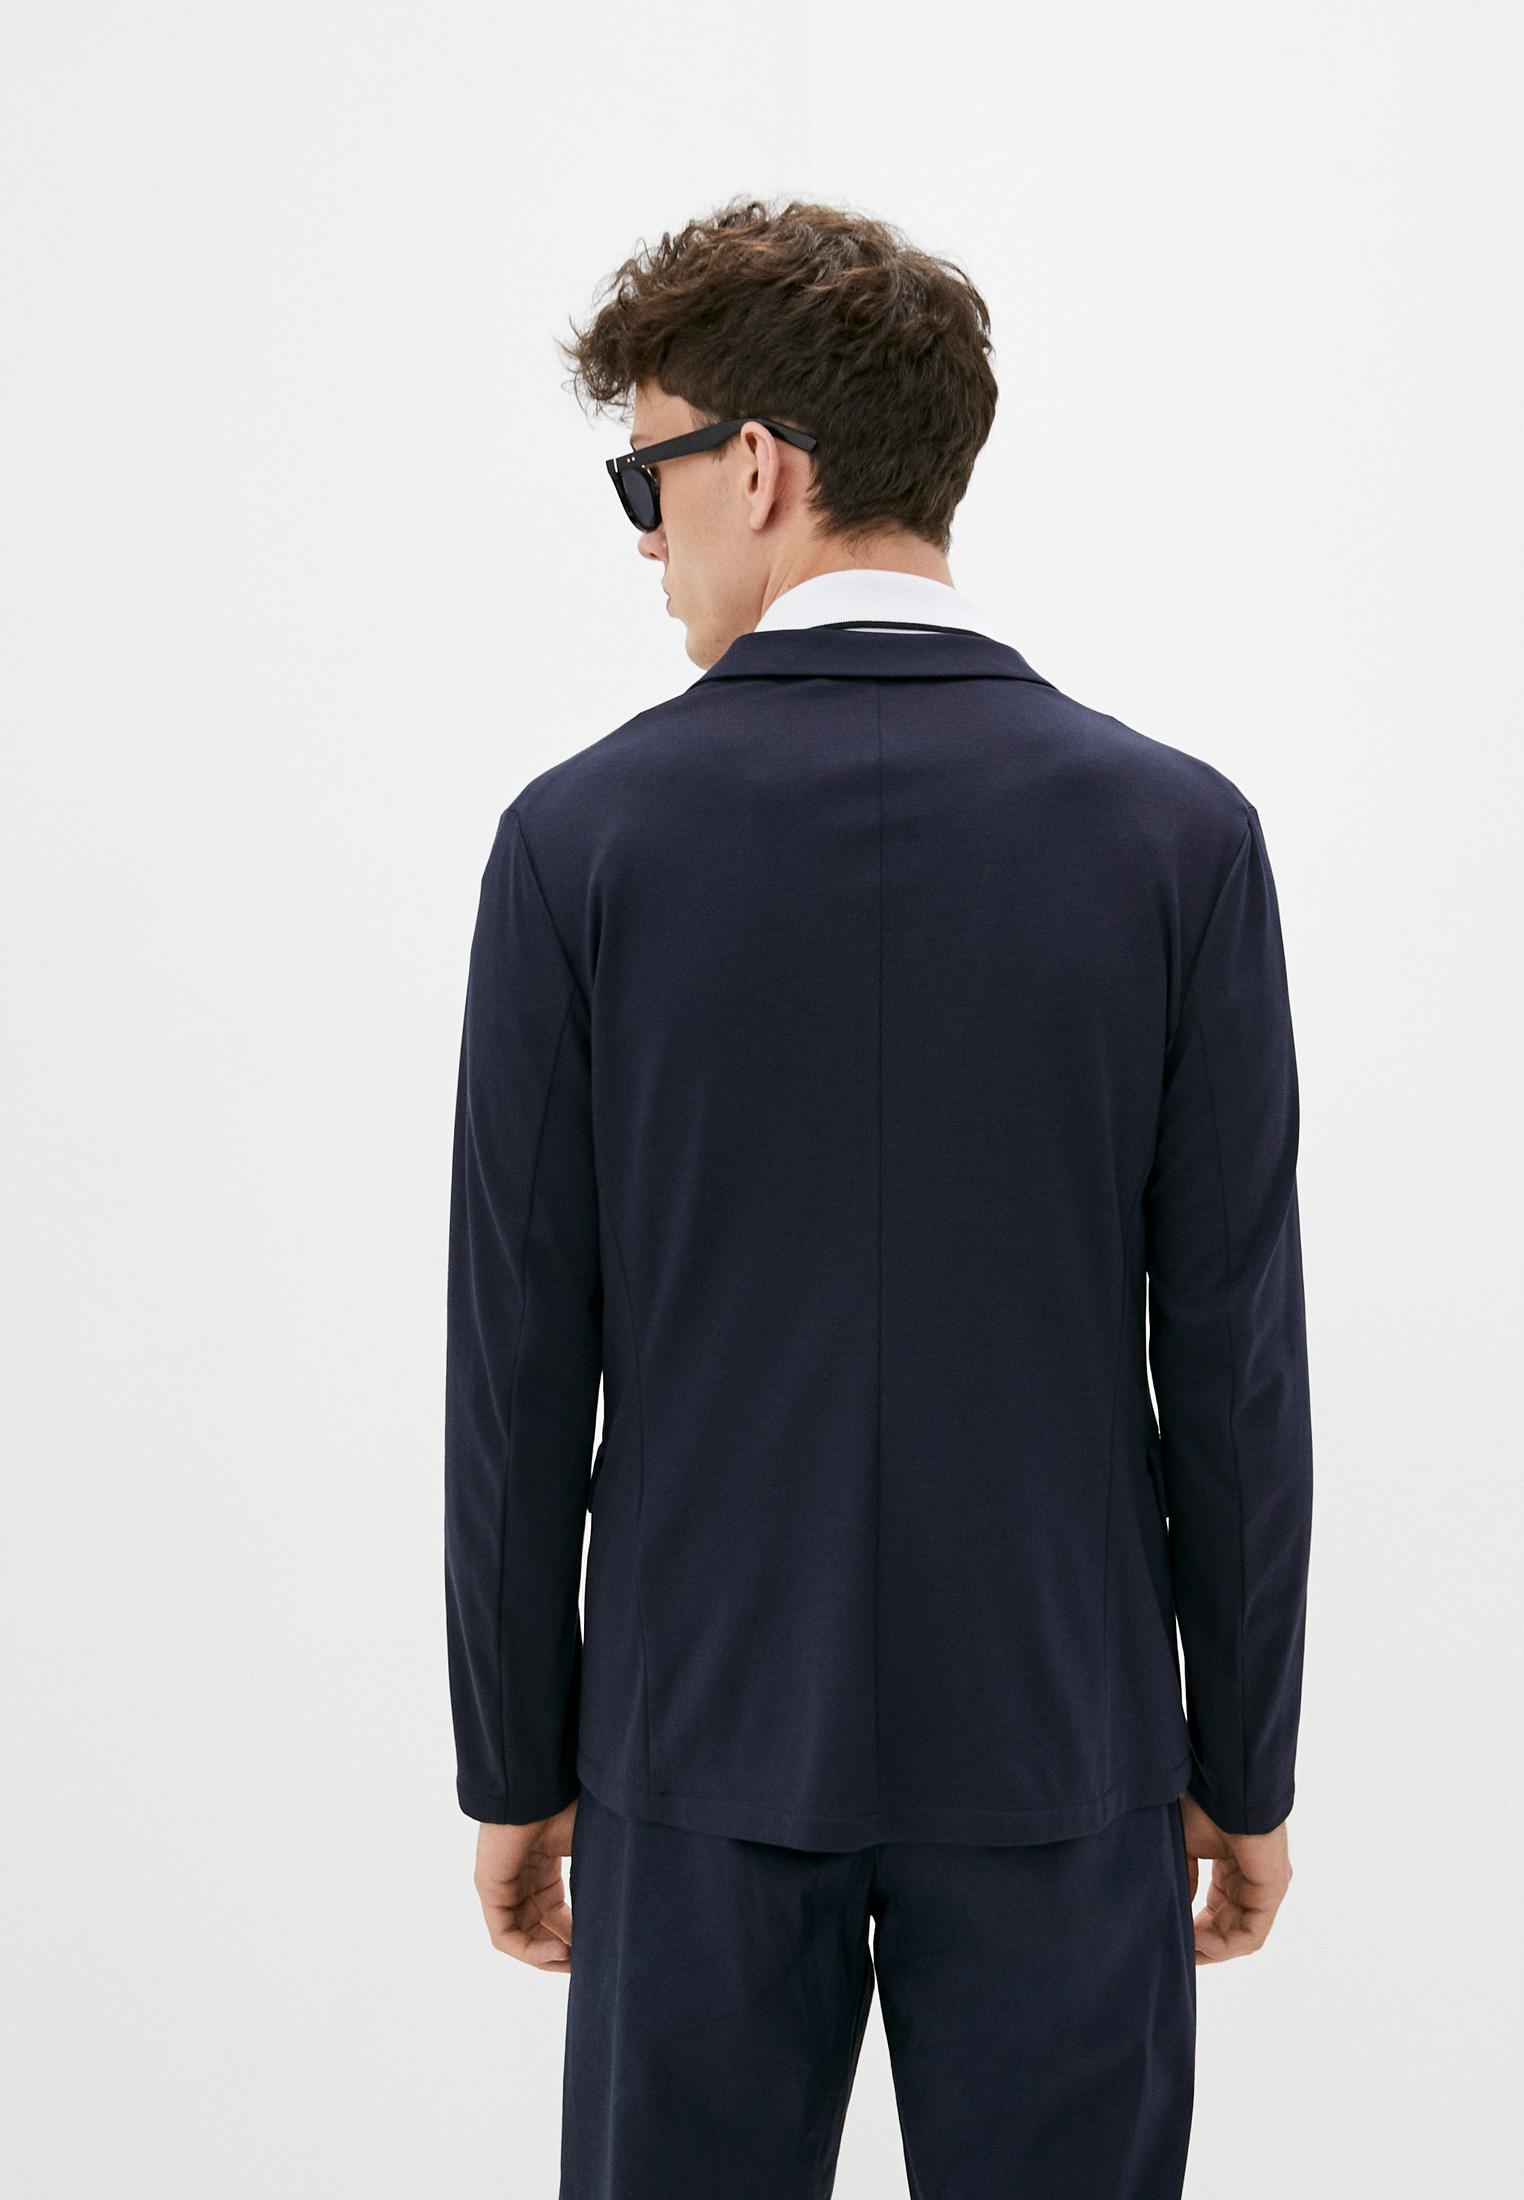 Мужской пиджак Armani Jeans (Армани Джинс) 7V6GG8 6JPRZ: изображение 4